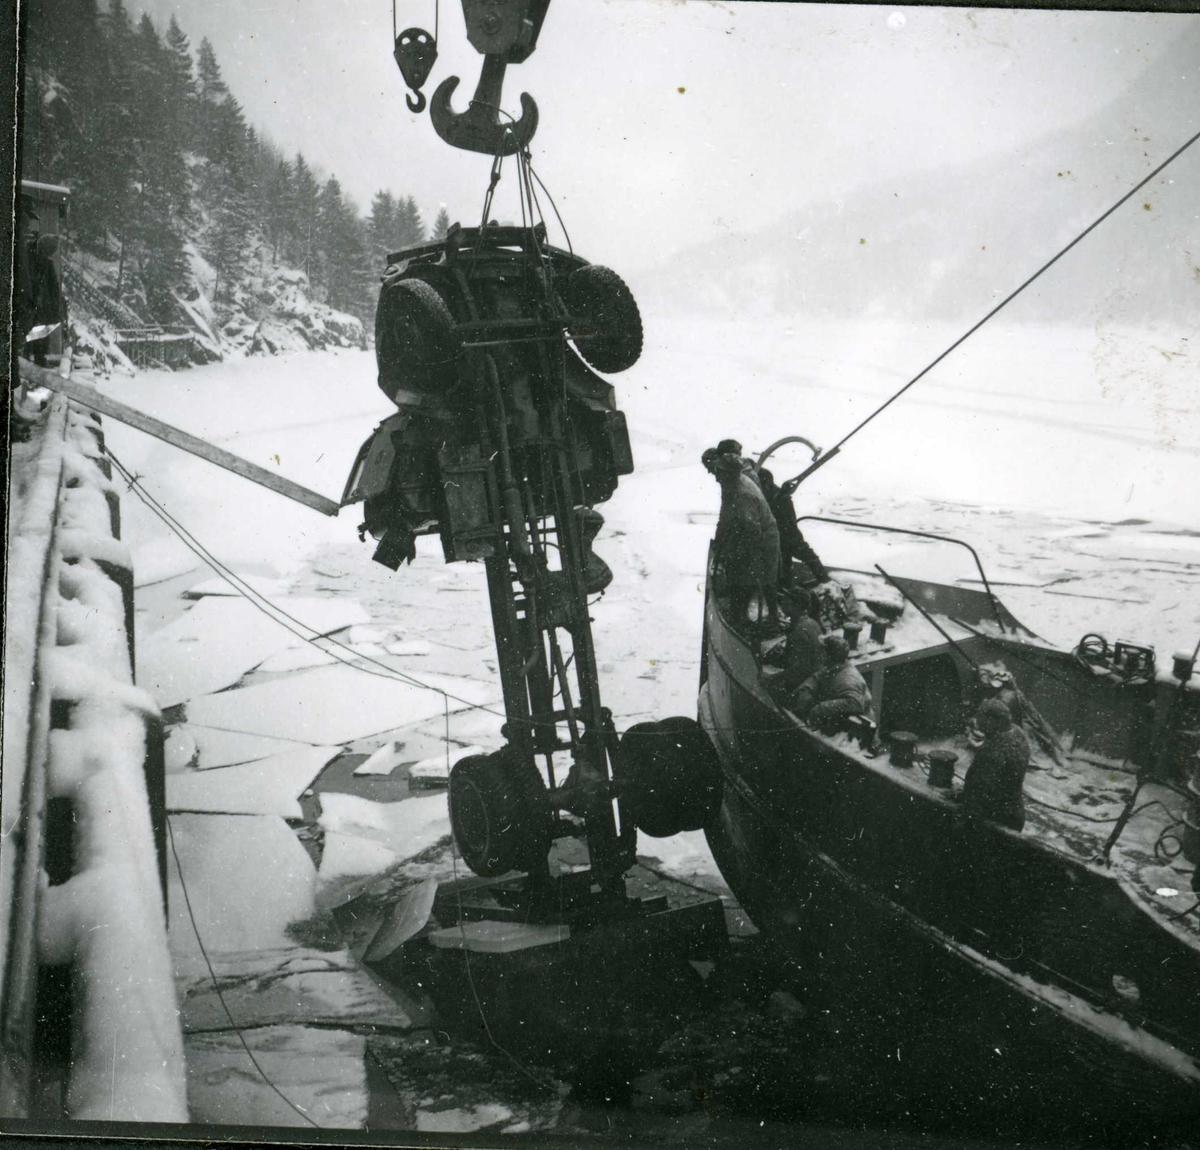 Dalen, lastebil i vannet, 18